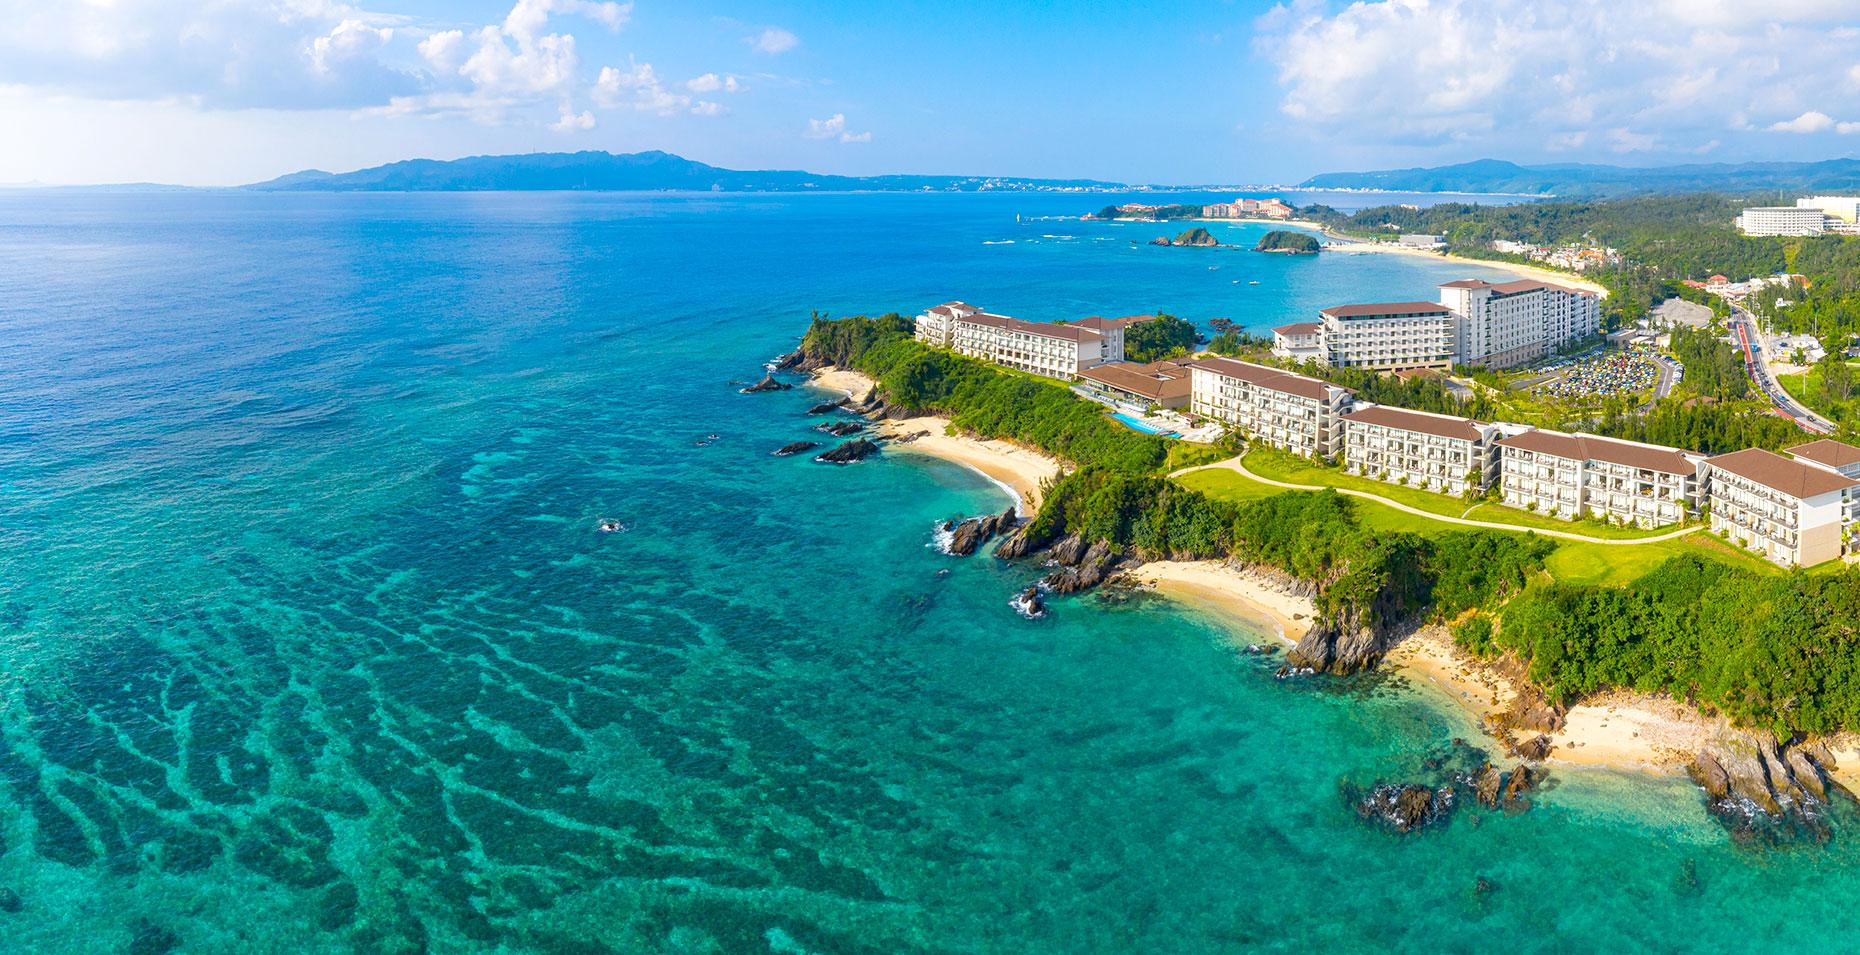 best hotel in Okinawa